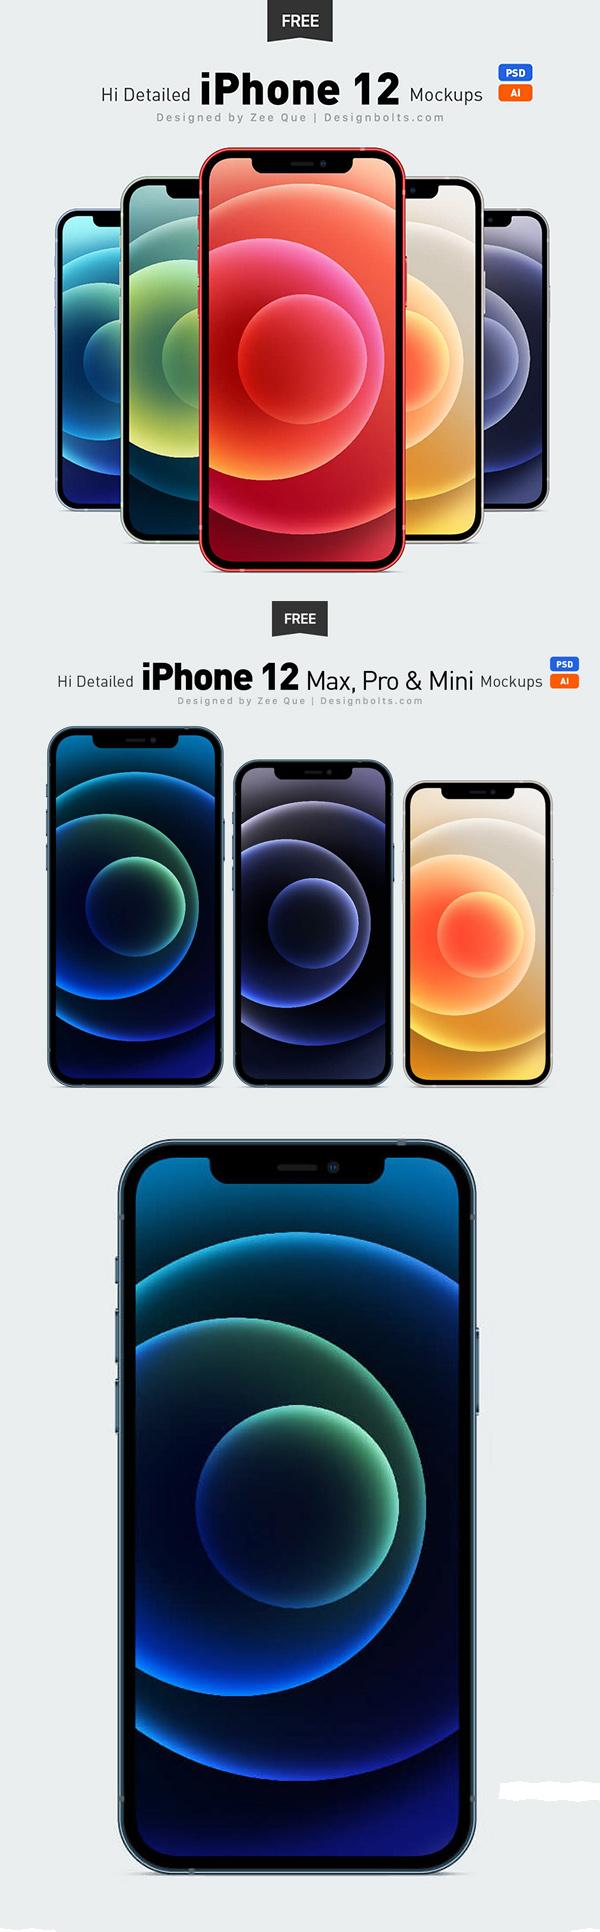 Free iPhone 12, iPhone 12 Pro & Max Ai & Mockup PSD Set